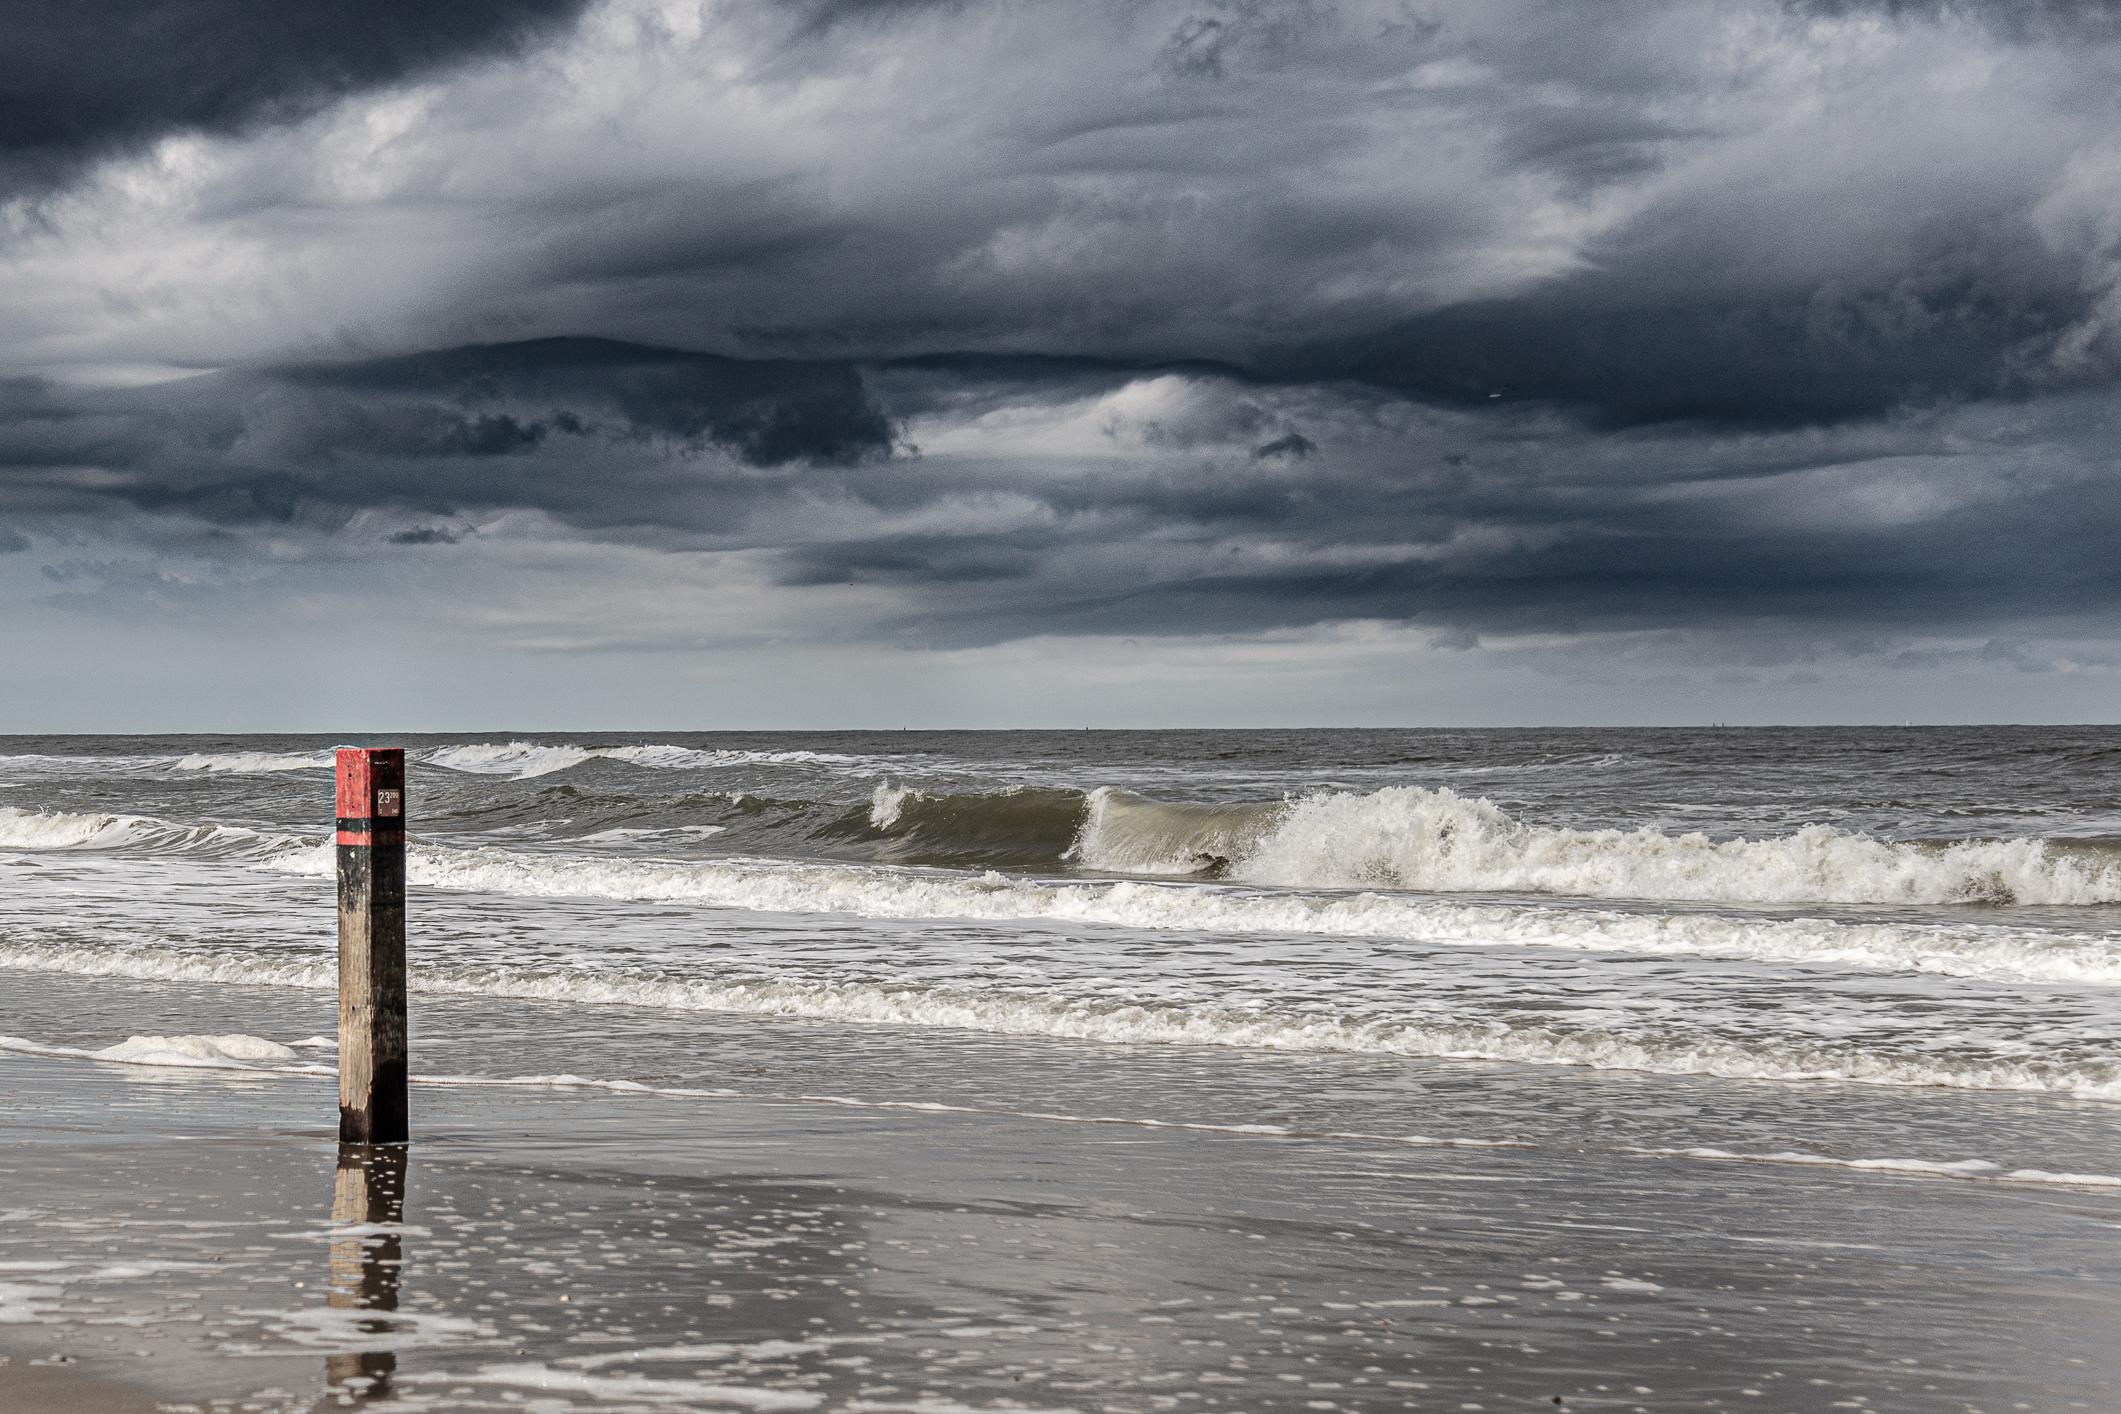 Storm en donkere lucht op het strand VVV Texel fotograaf Wilfried Manhaeve